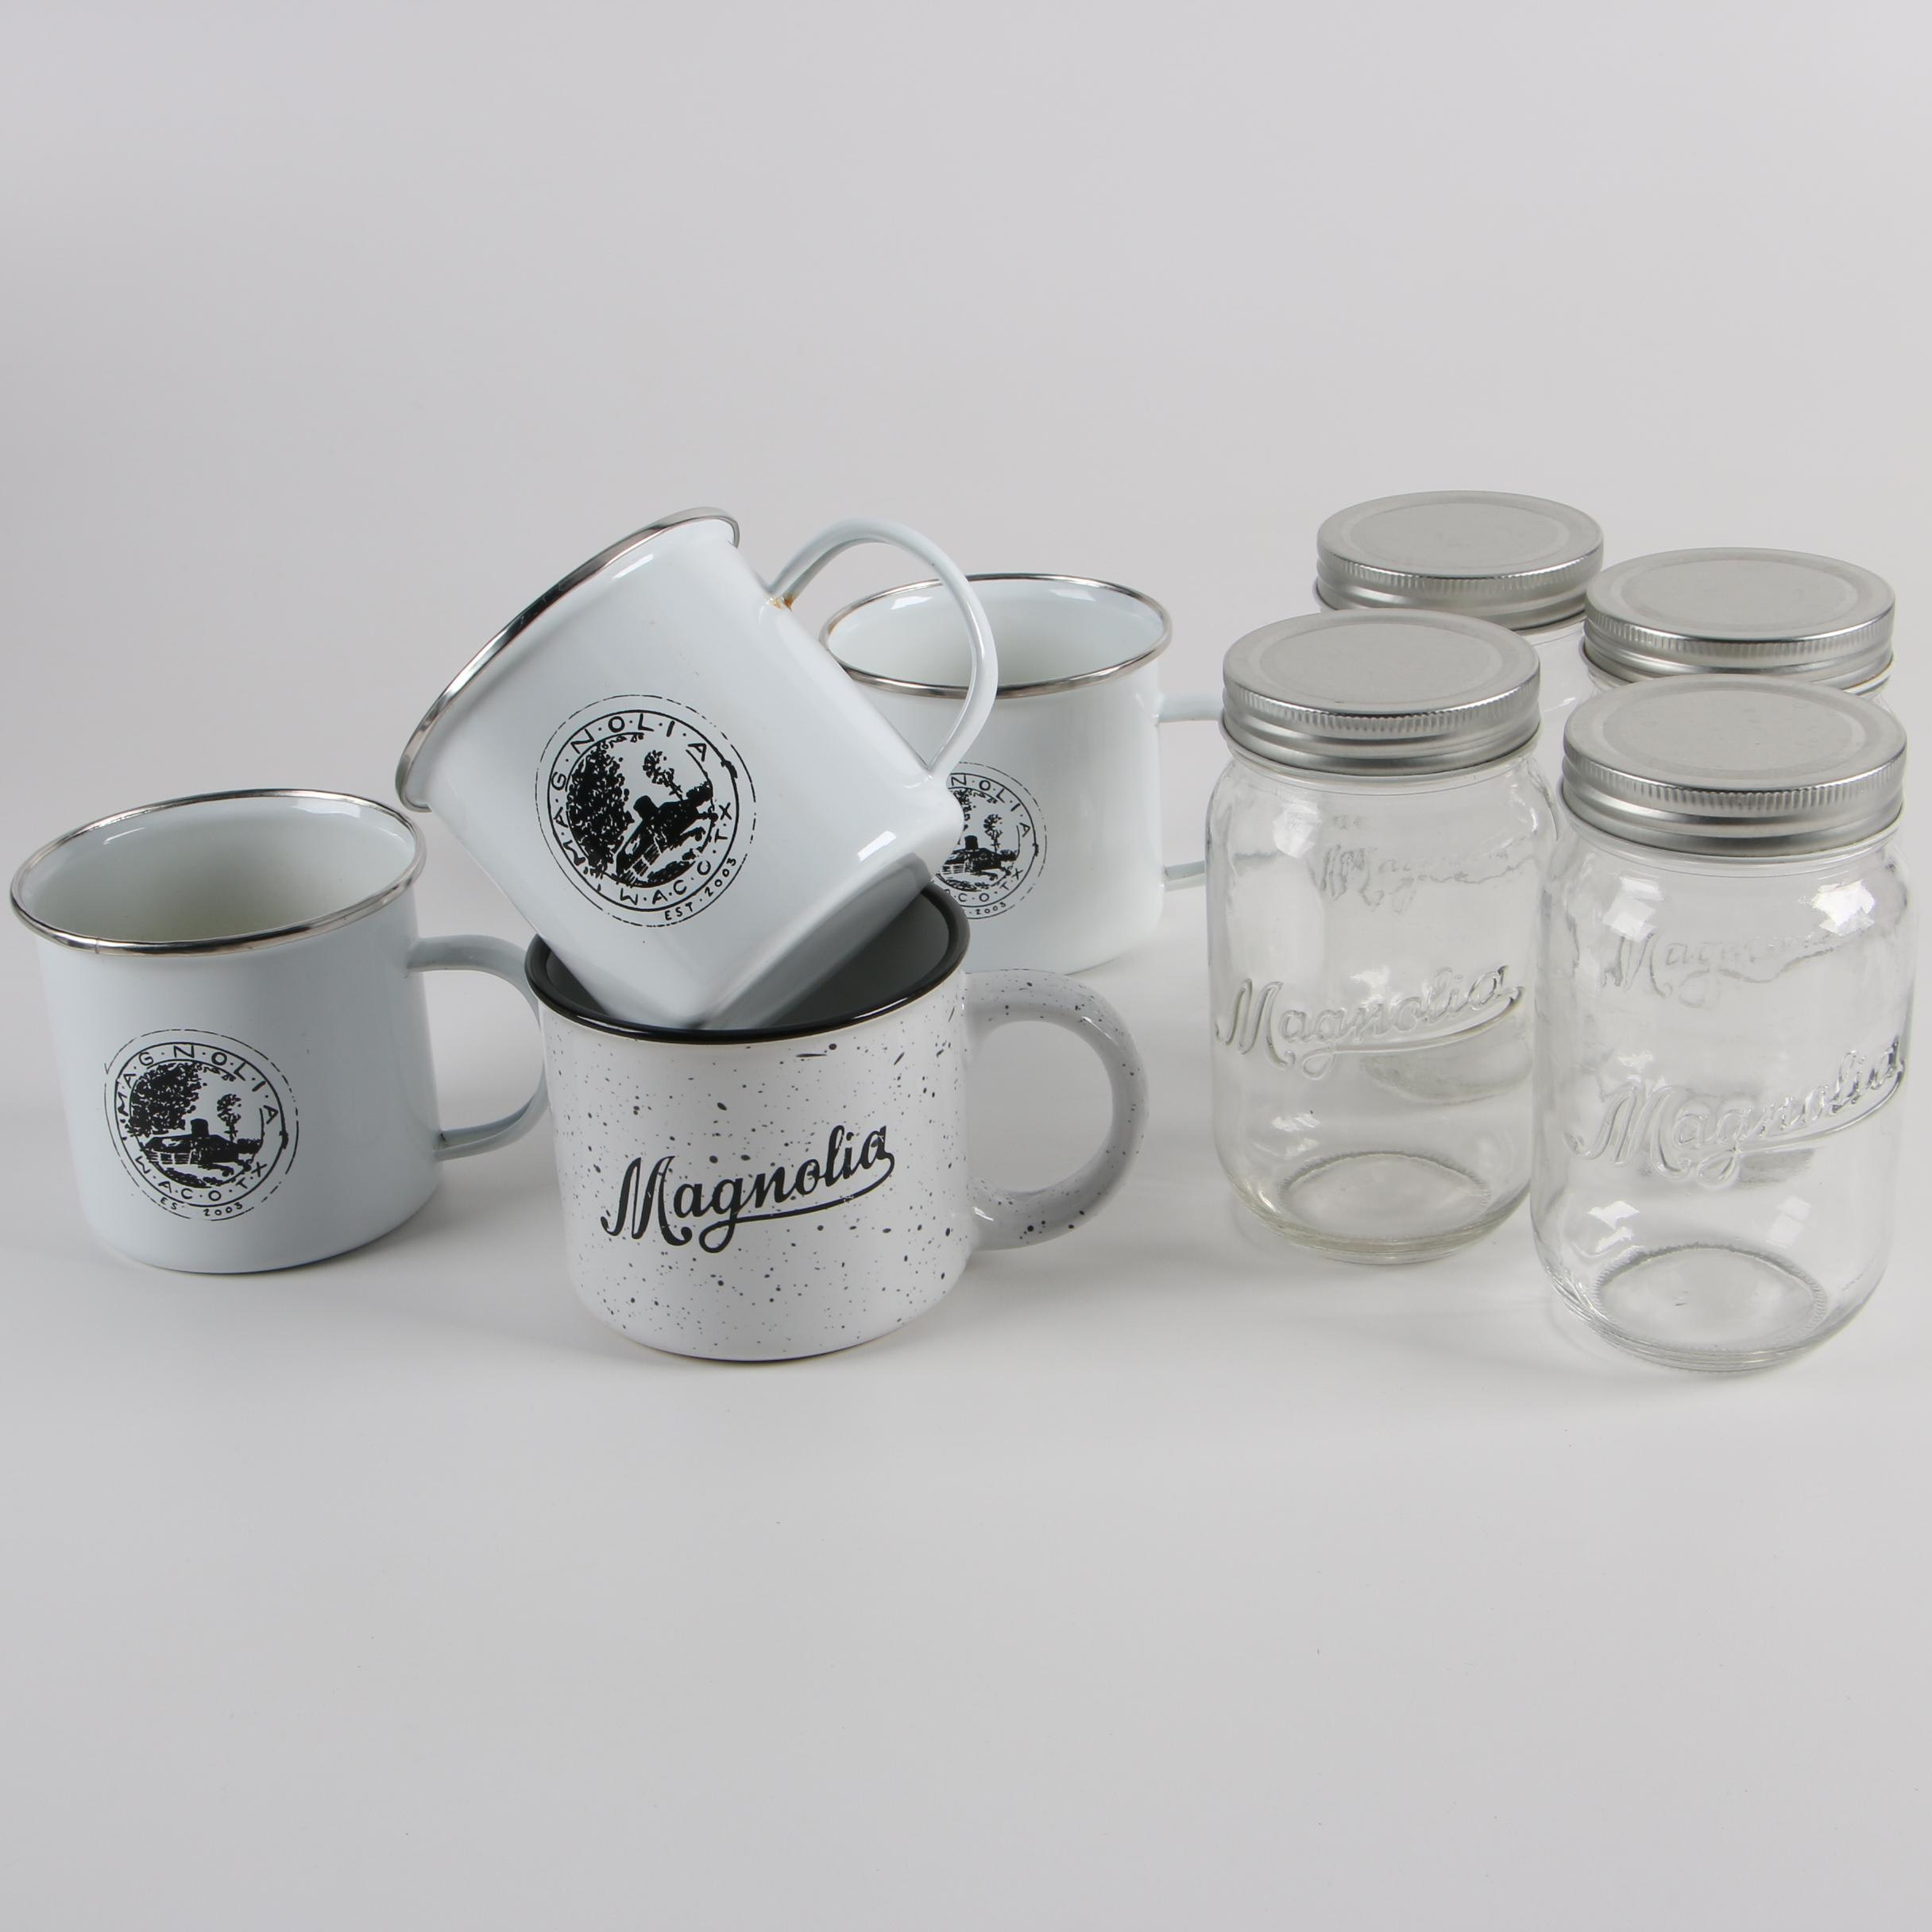 Magnolia Enamel Mugs and Glass Jars